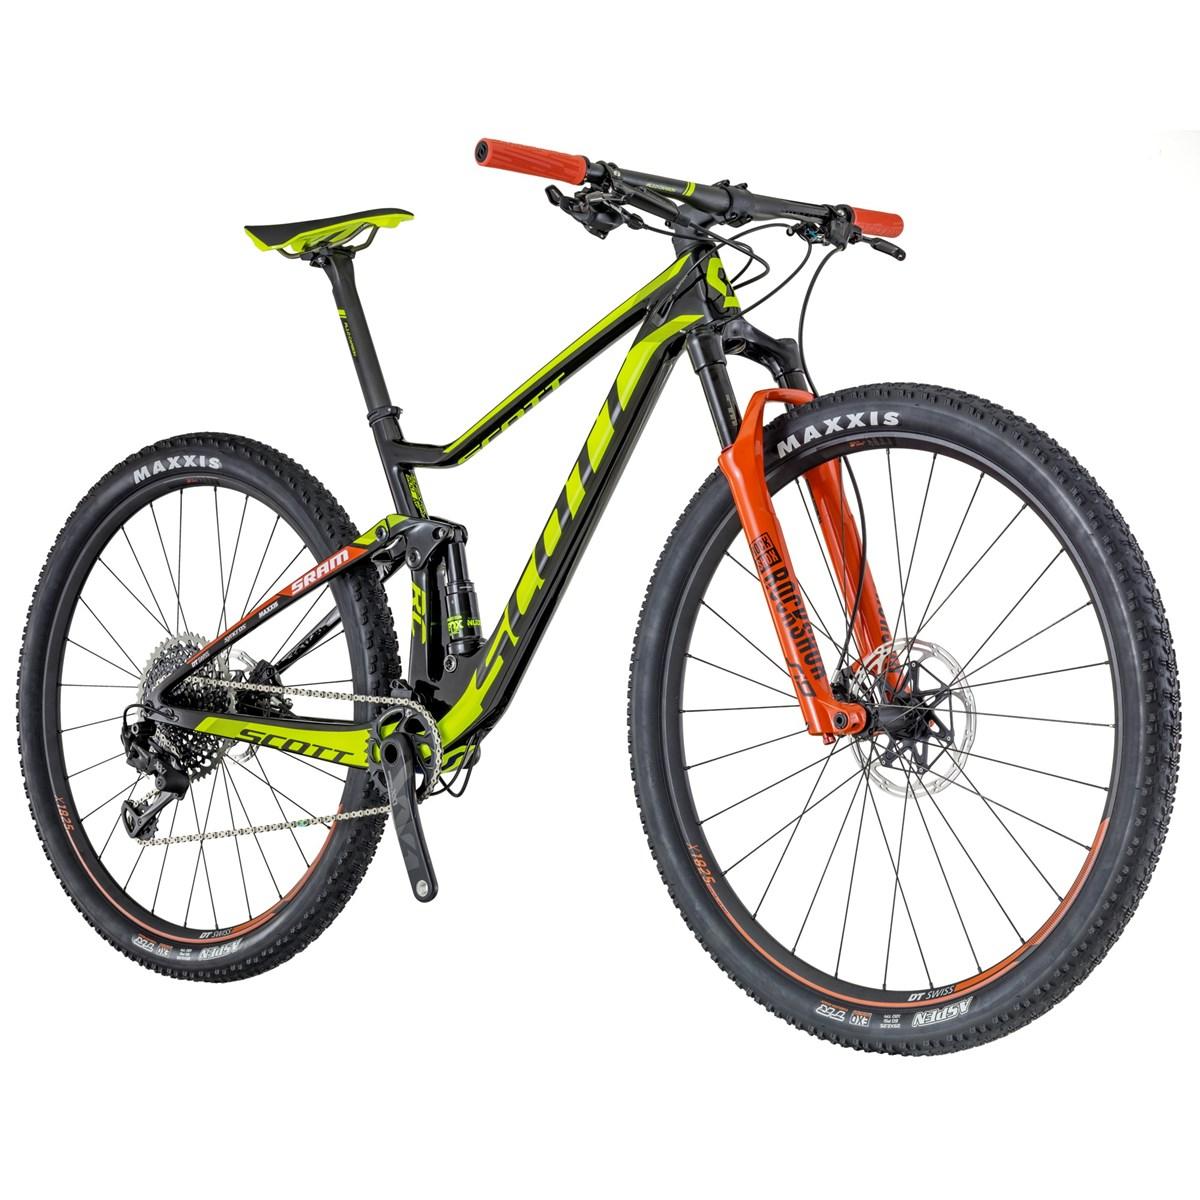 Scott Spark 700 SL 2014 review - The Bike List